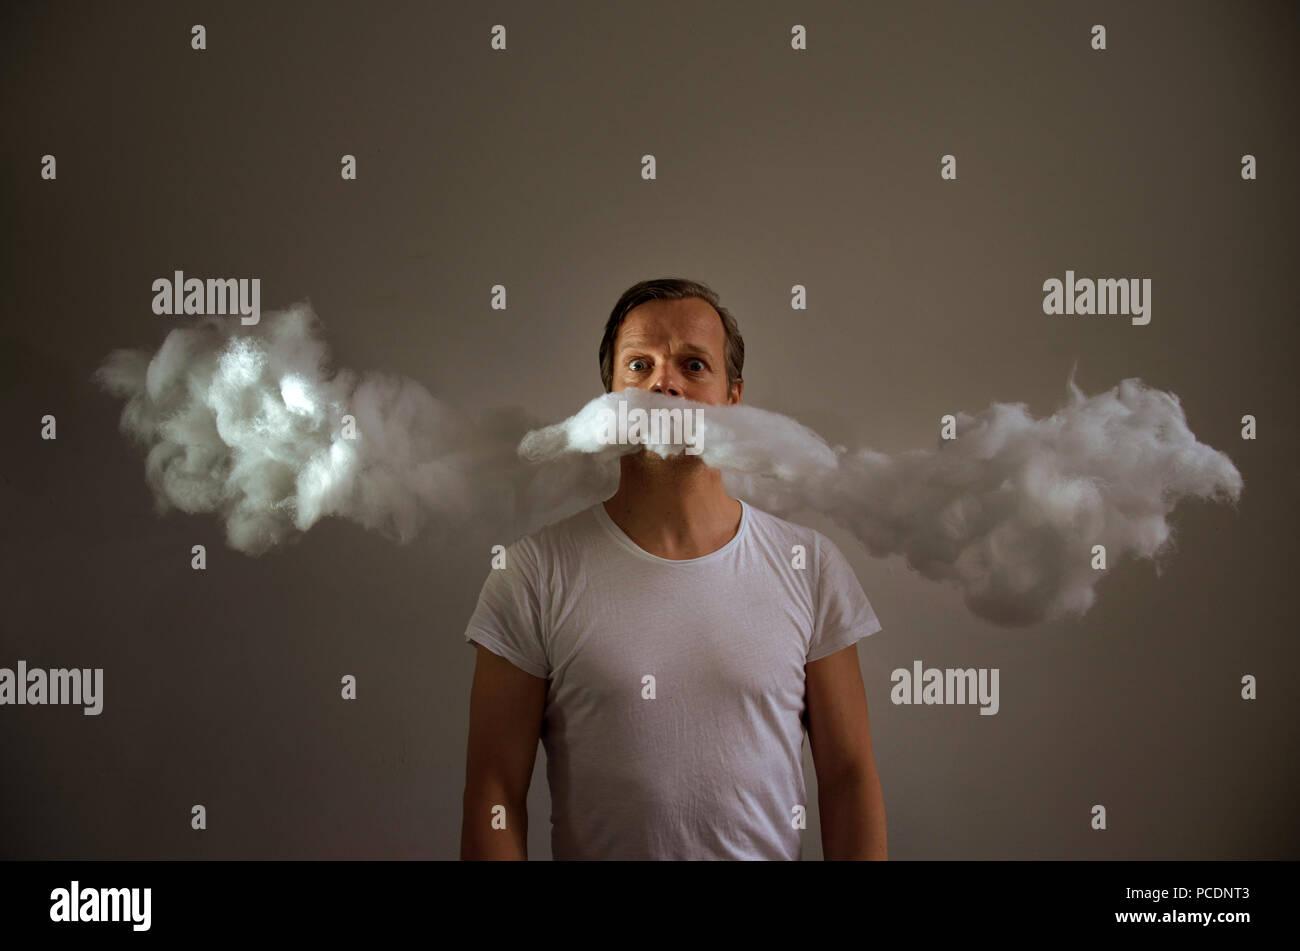 man,mustache - Stock Image